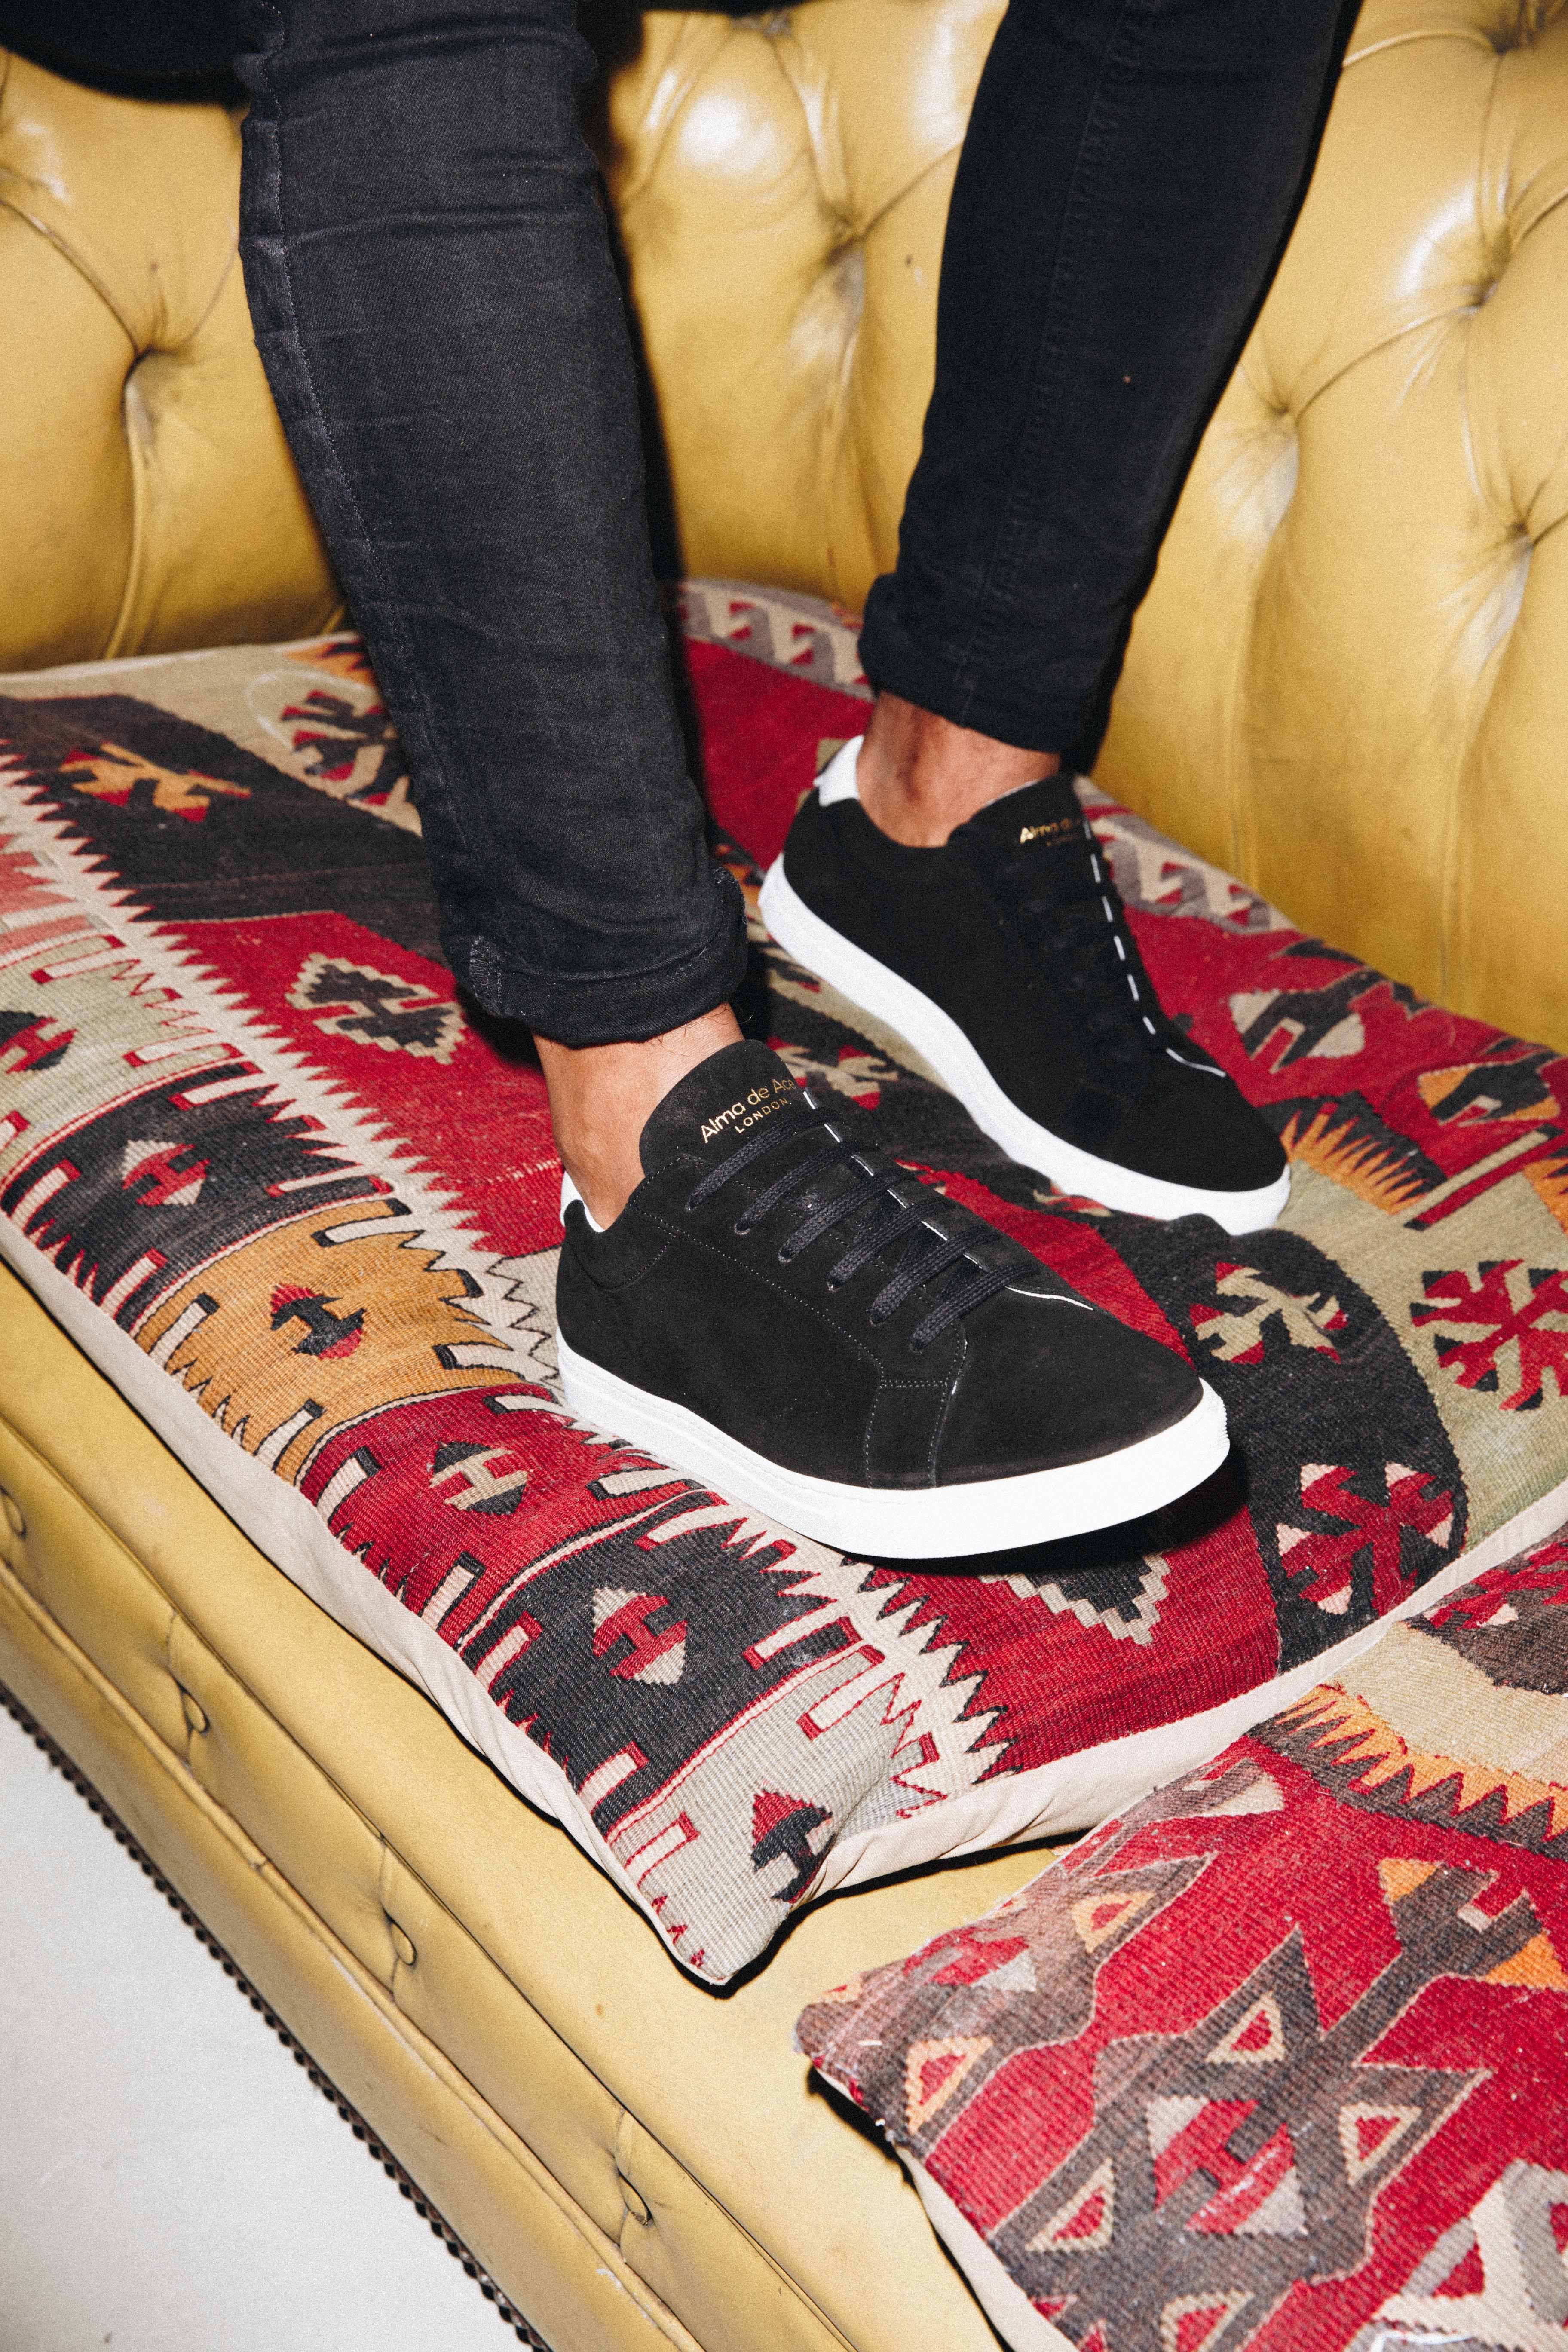 The Black Suede Original Sneaker